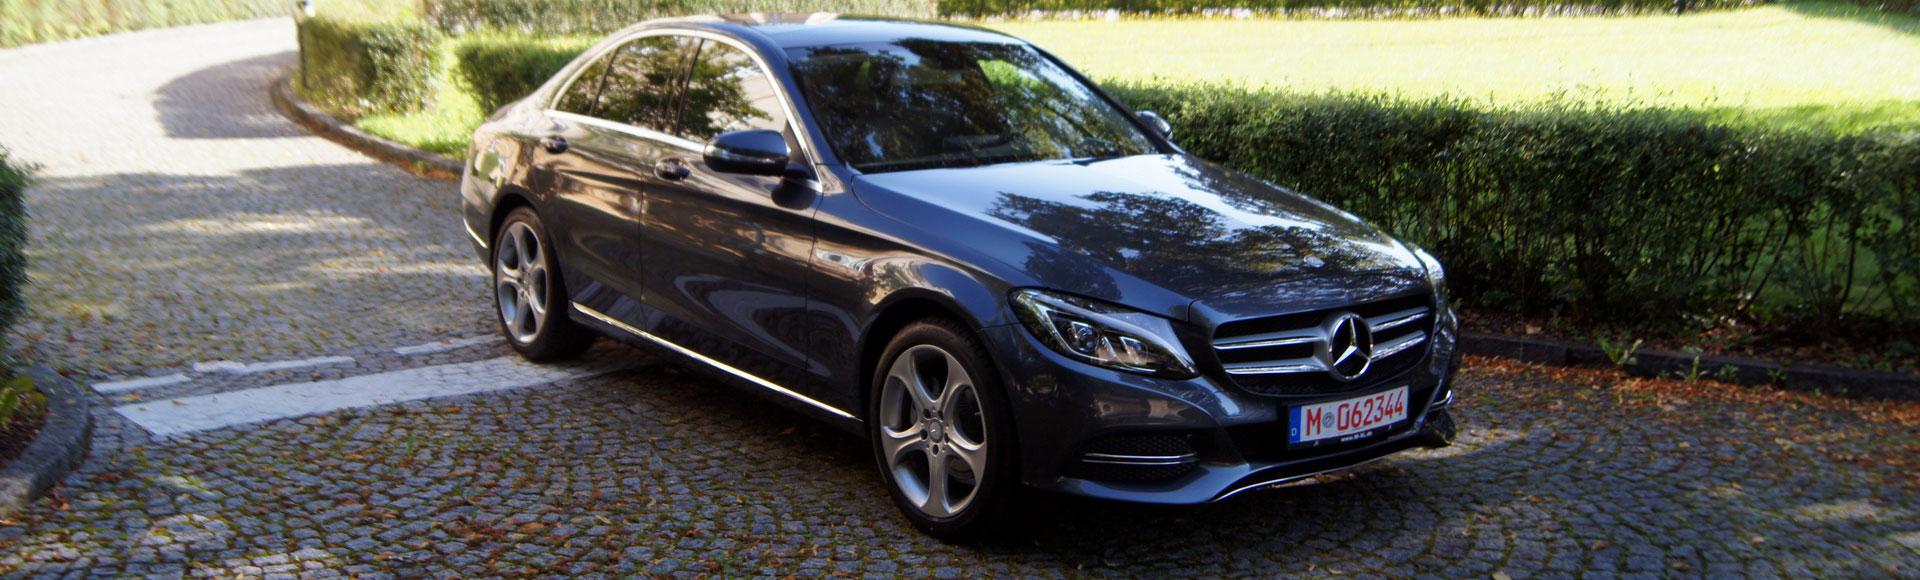 Mercedes Benz C200 2014 Sommer 8439